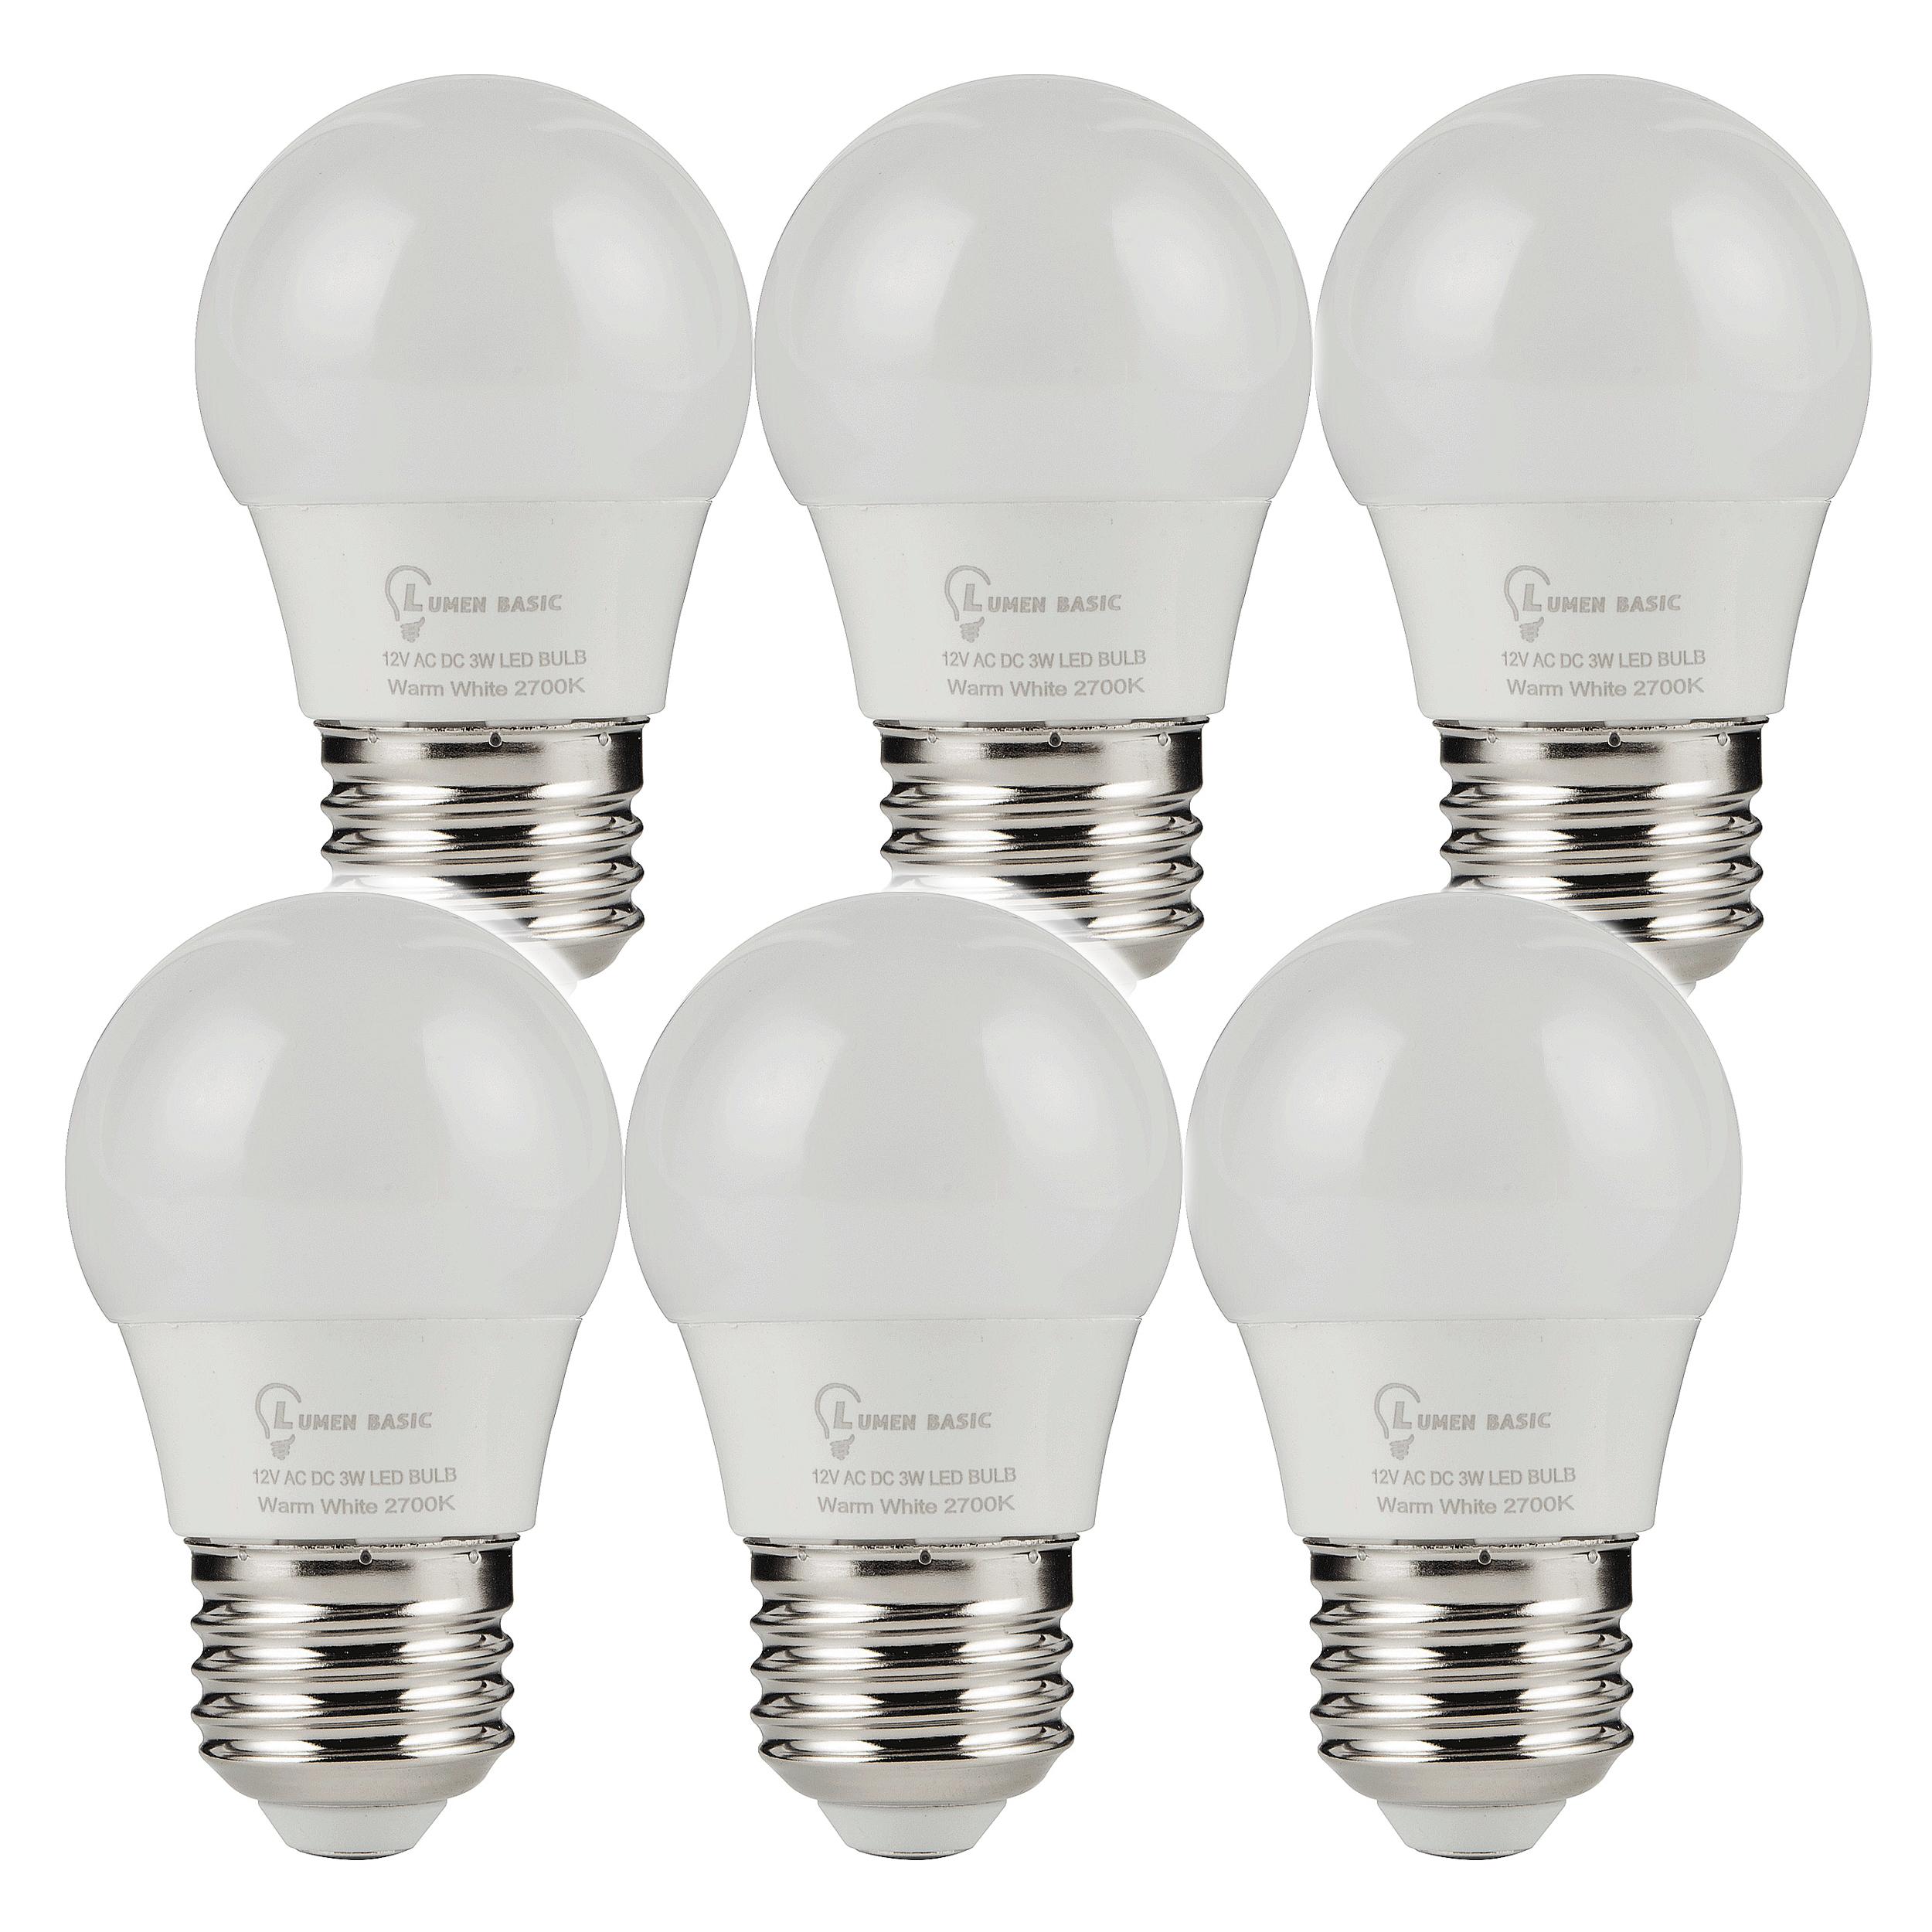 Cfl Light Bulbs Diagram Mainsoperatedledlamp